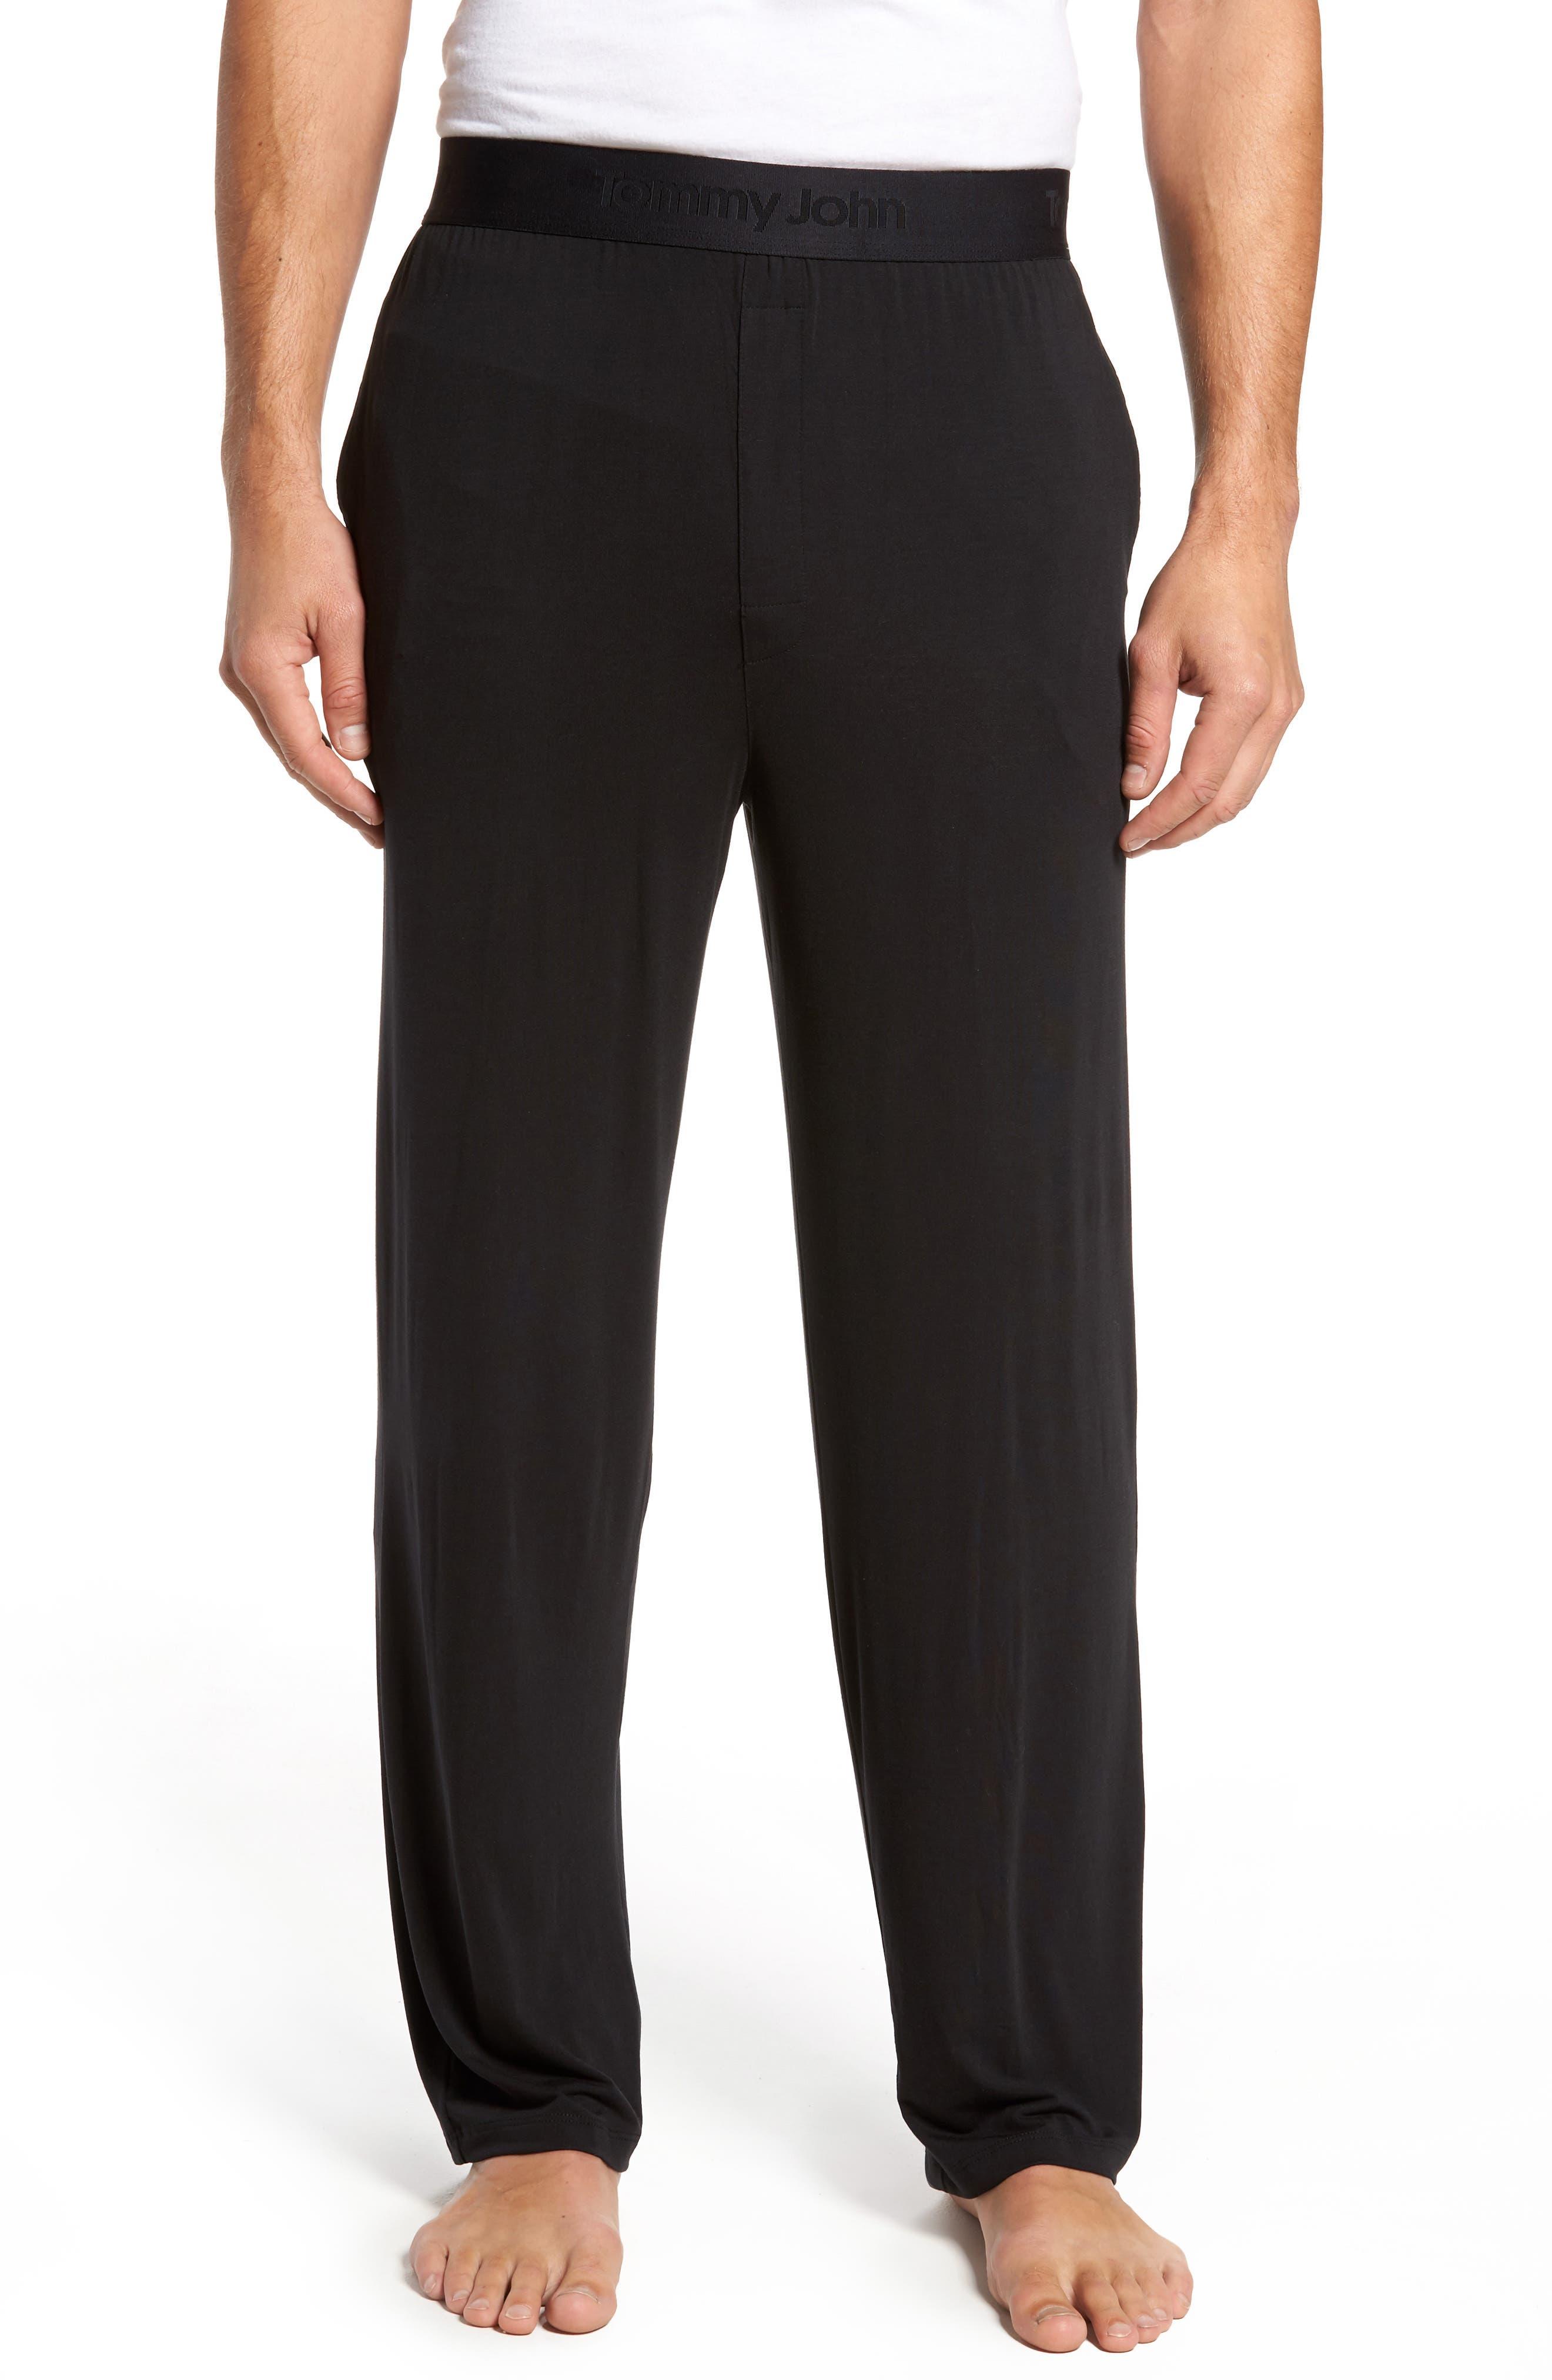 Second Skin Lounge Pants,                             Main thumbnail 1, color,                             BLACK